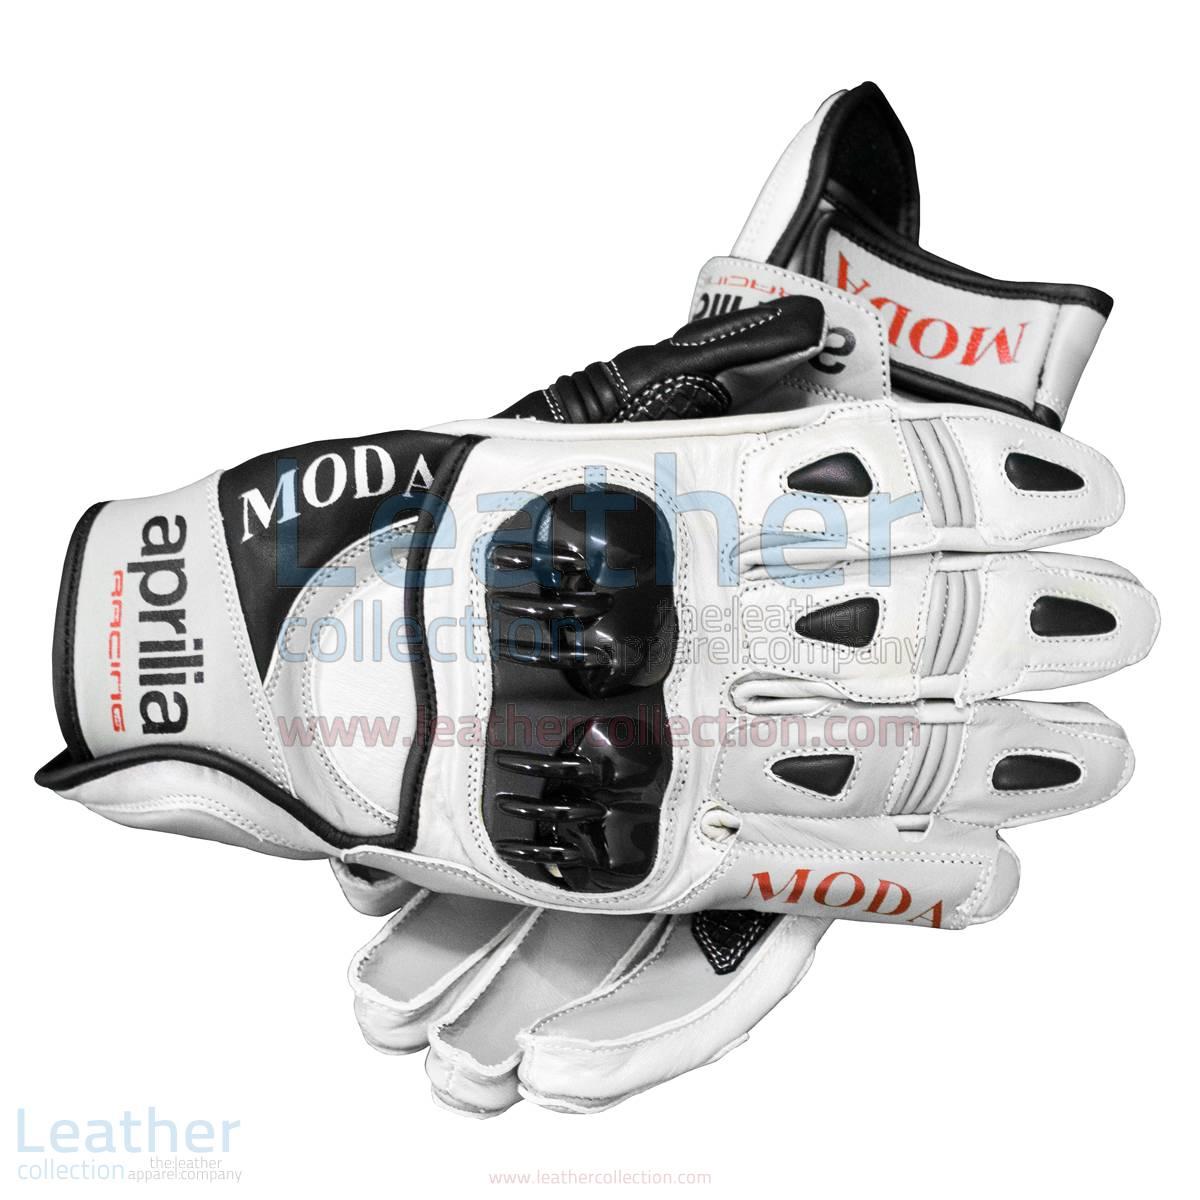 Aprilia Short Leather Riding Gloves